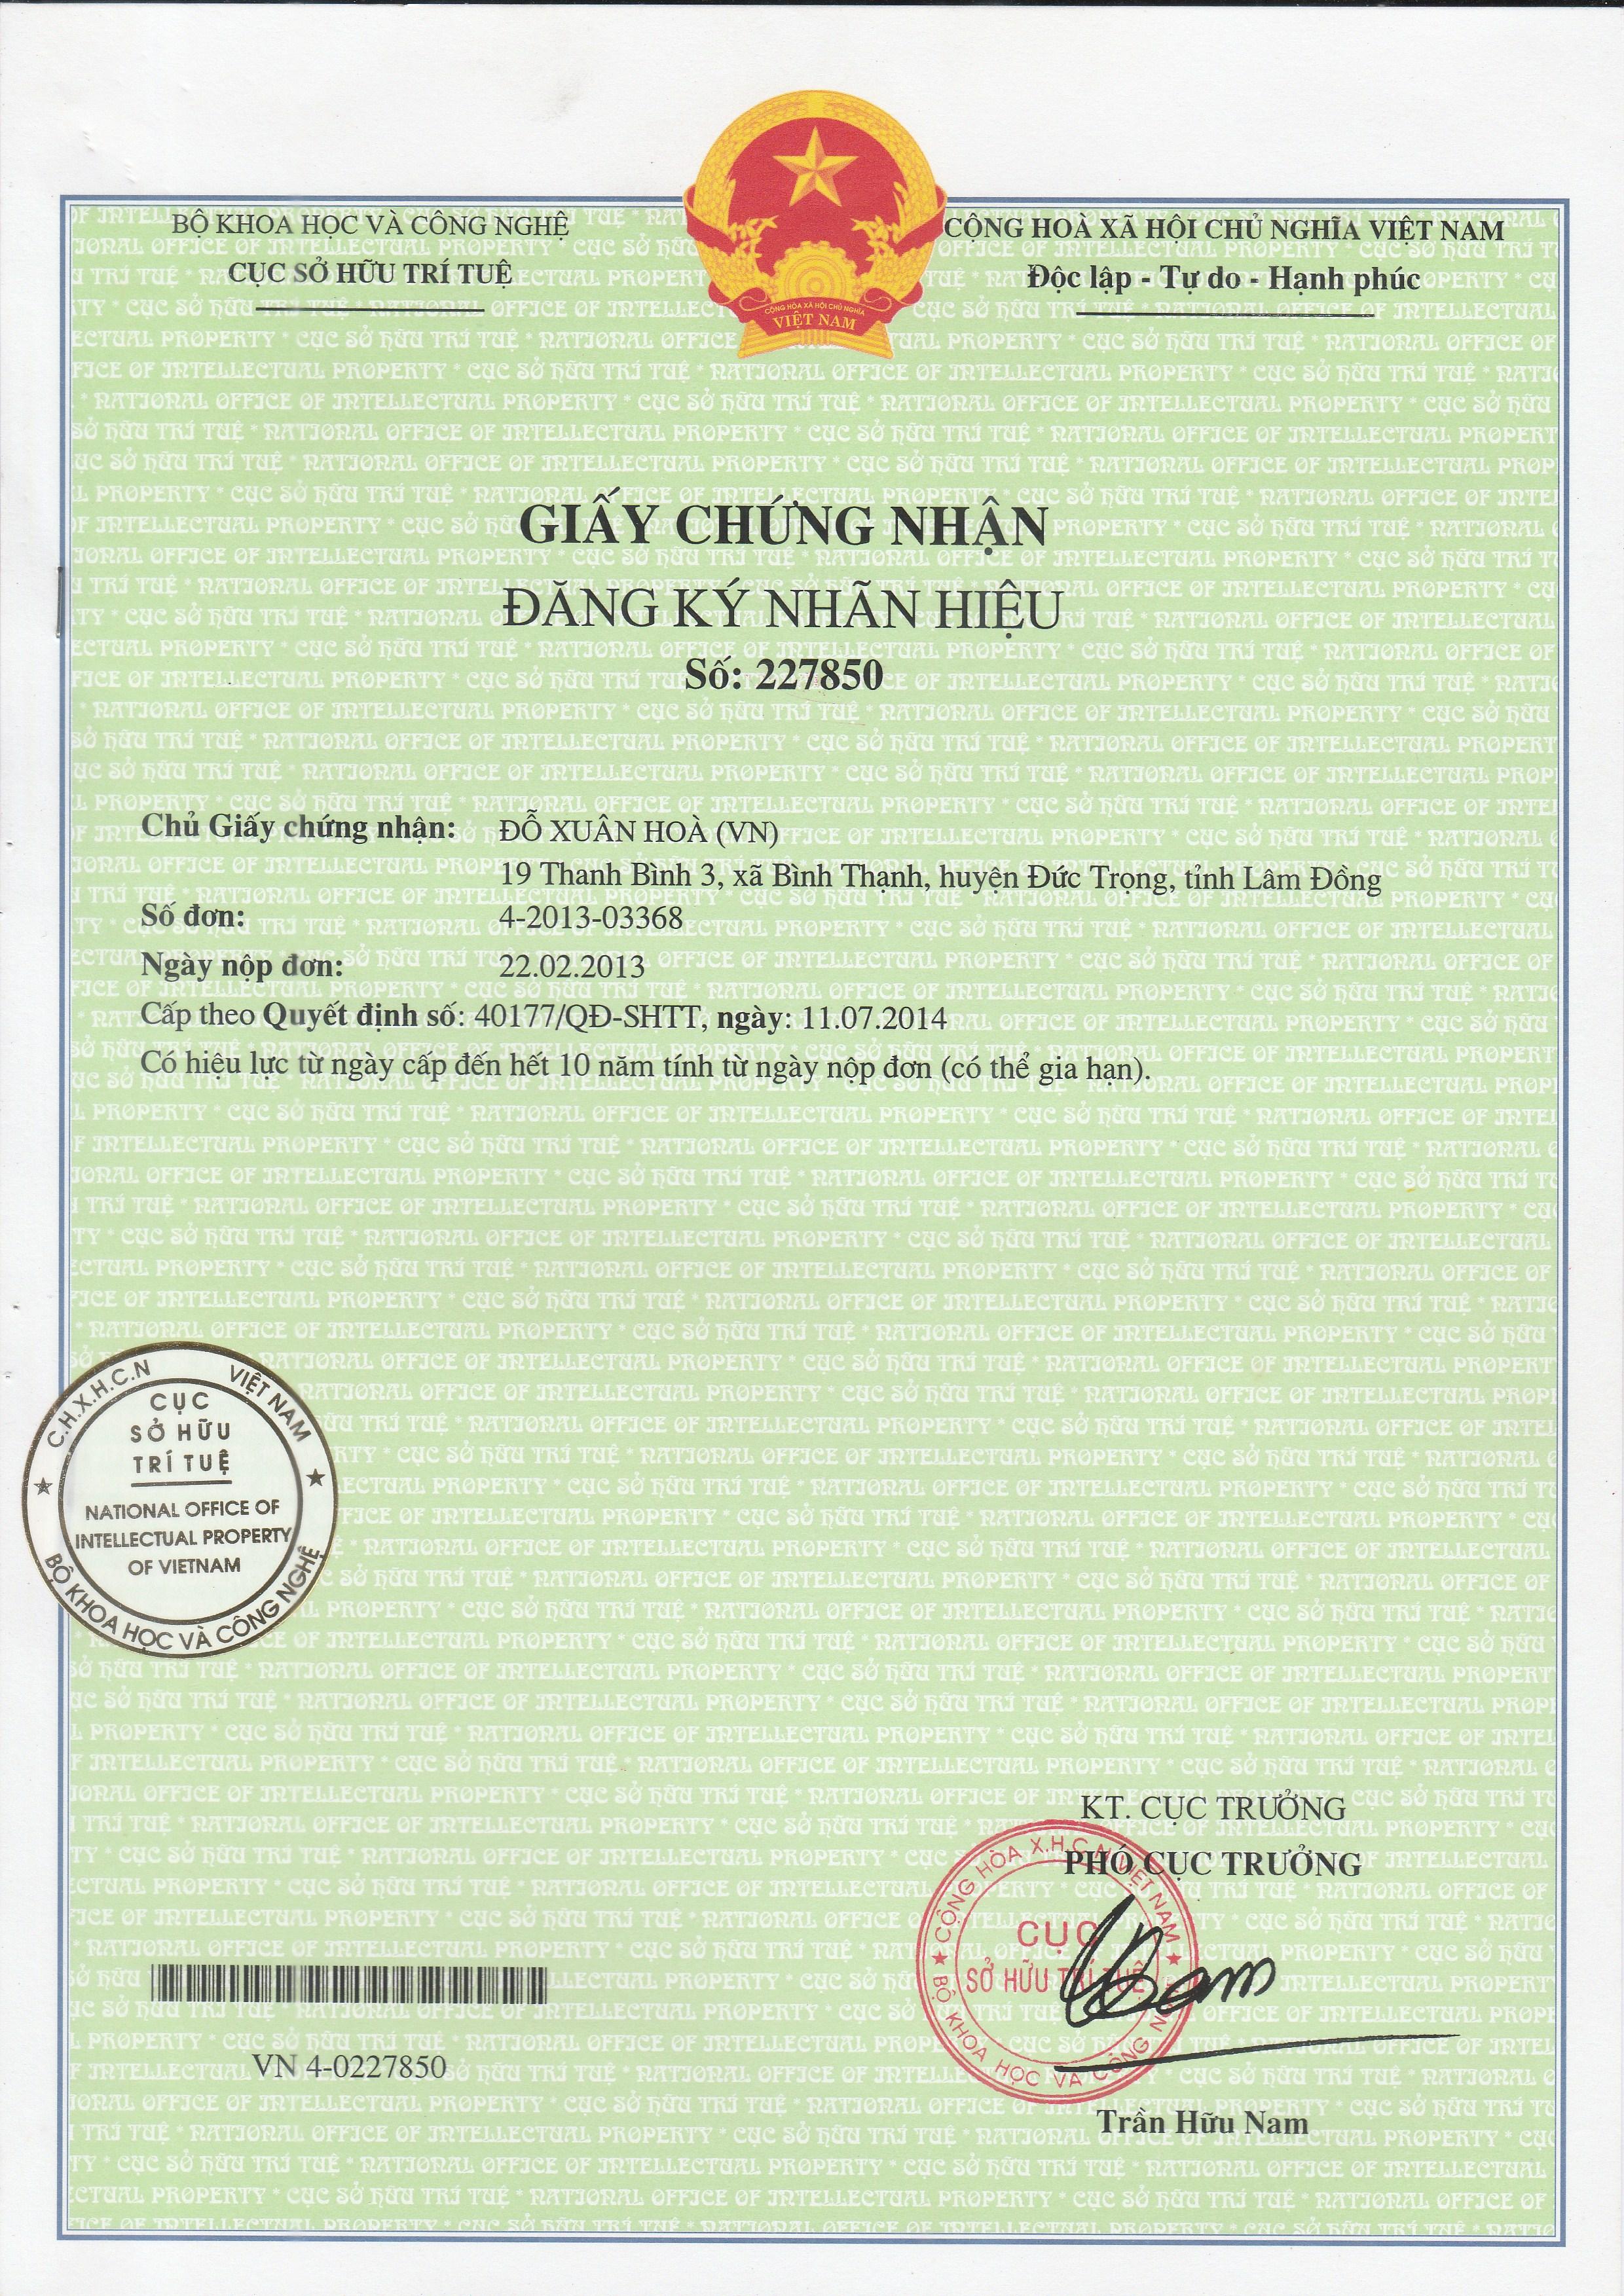 3.Giay-chung-nhan-dang-ky-nhan-hieu-hoa-canh-do-xu-hoa-canh-da-lat-cay-canh-lam-dong-1